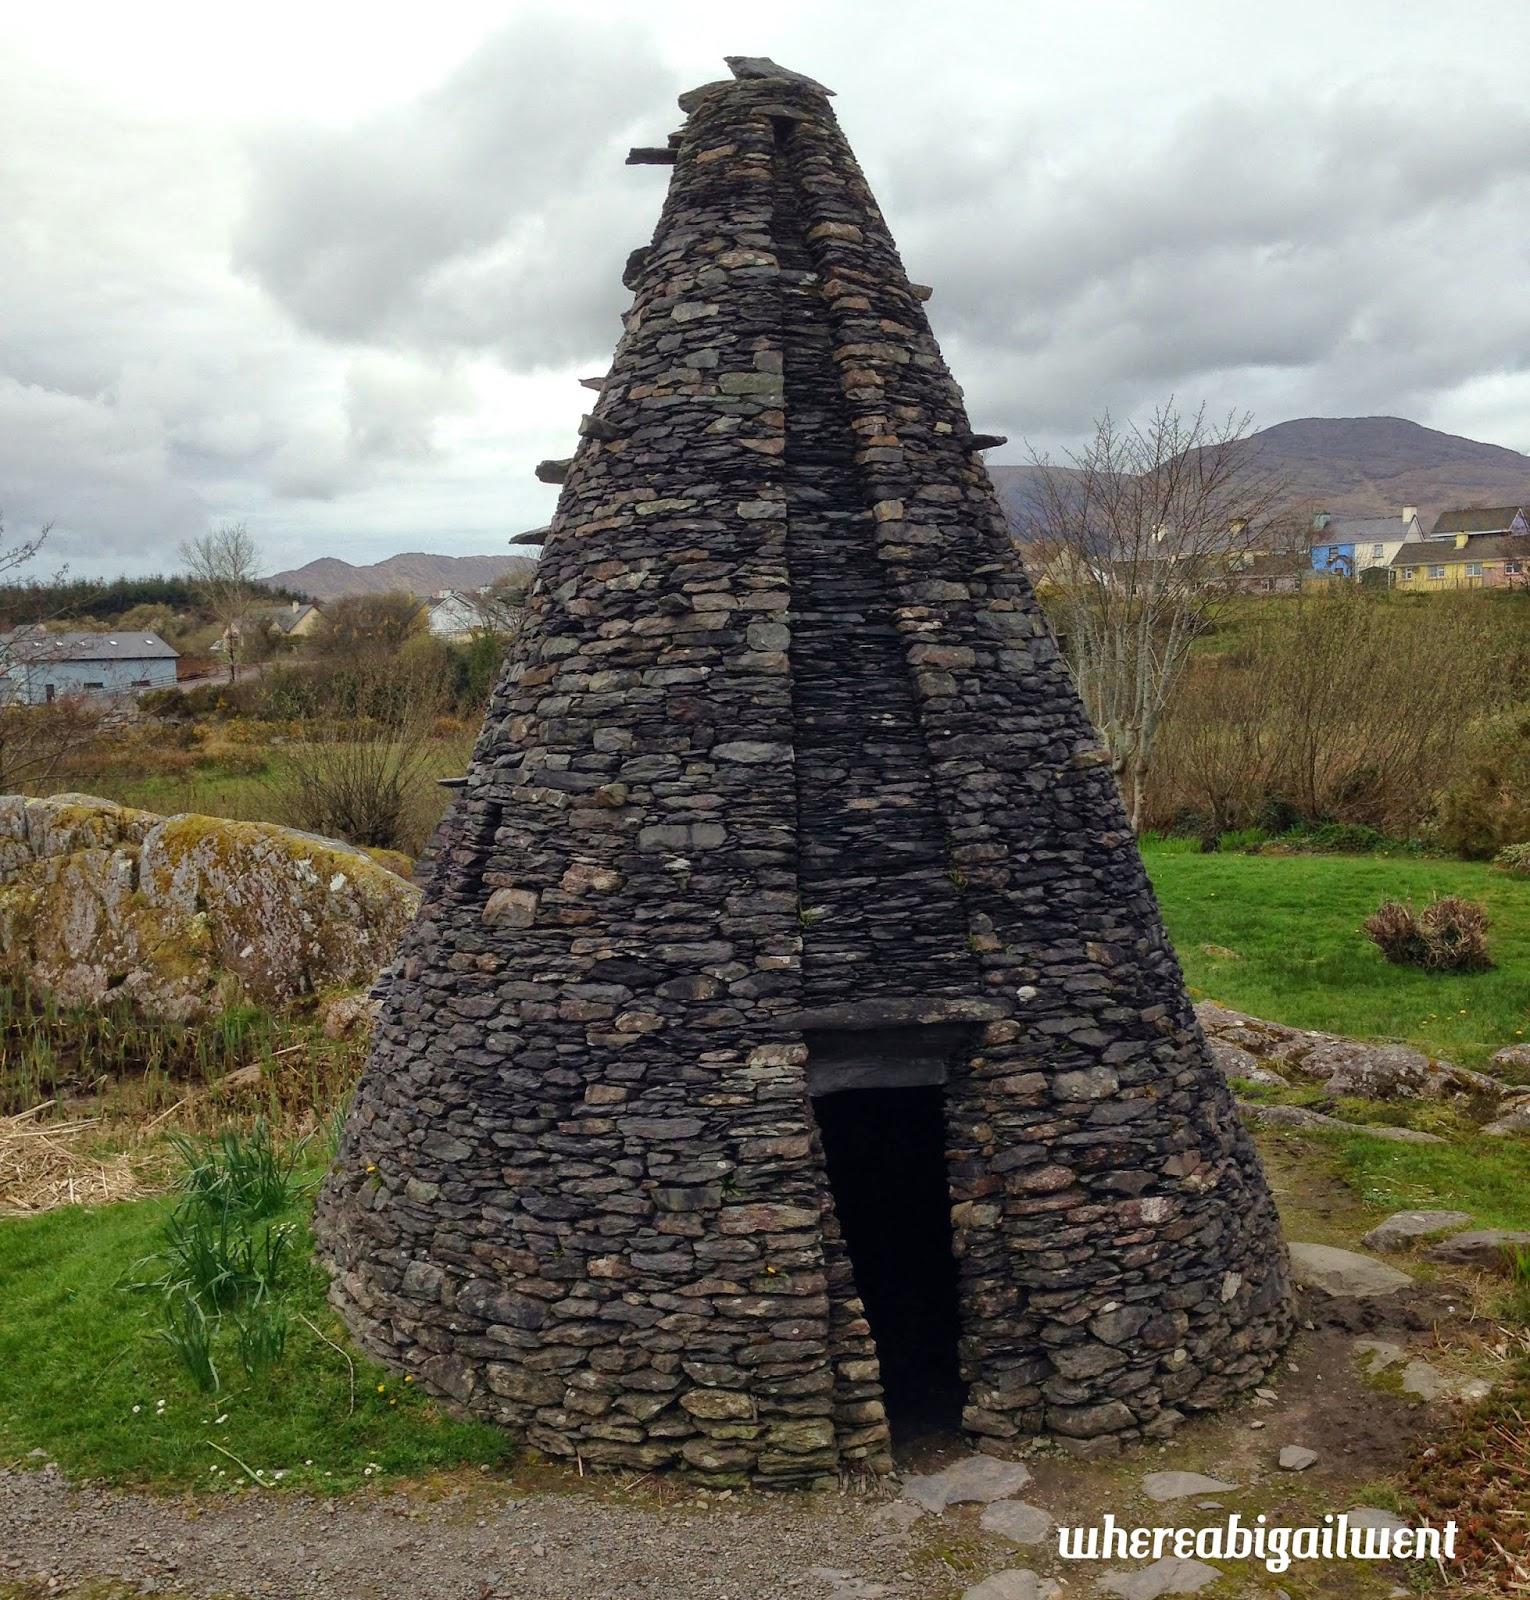 Irish Fairies Built Pyramids